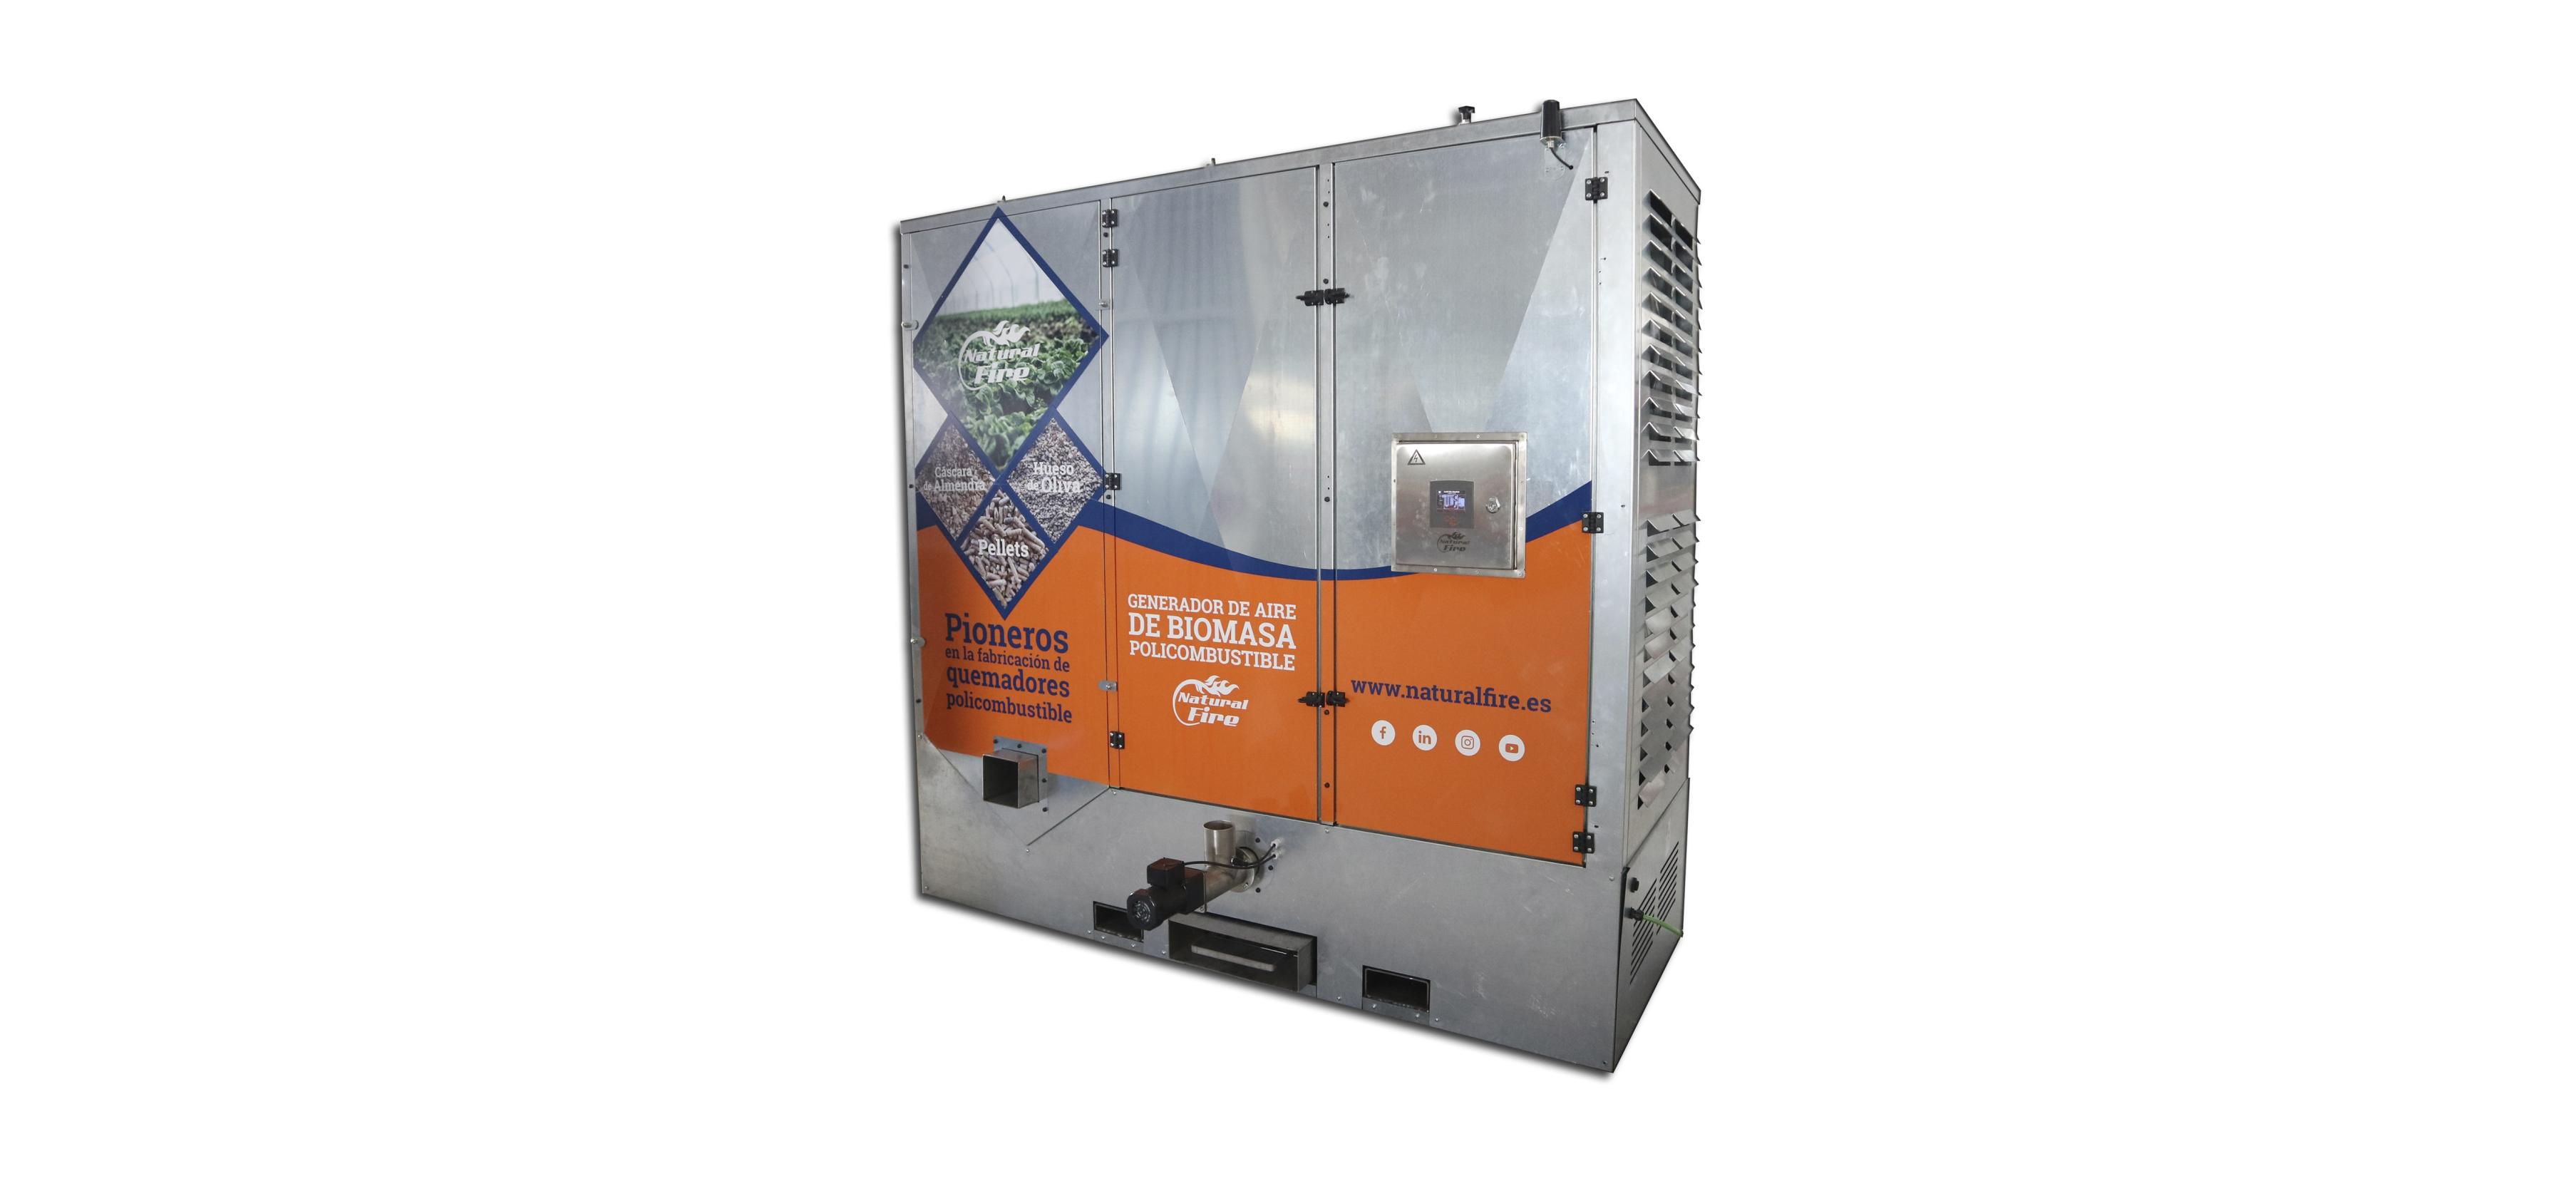 GNF-300 air generator